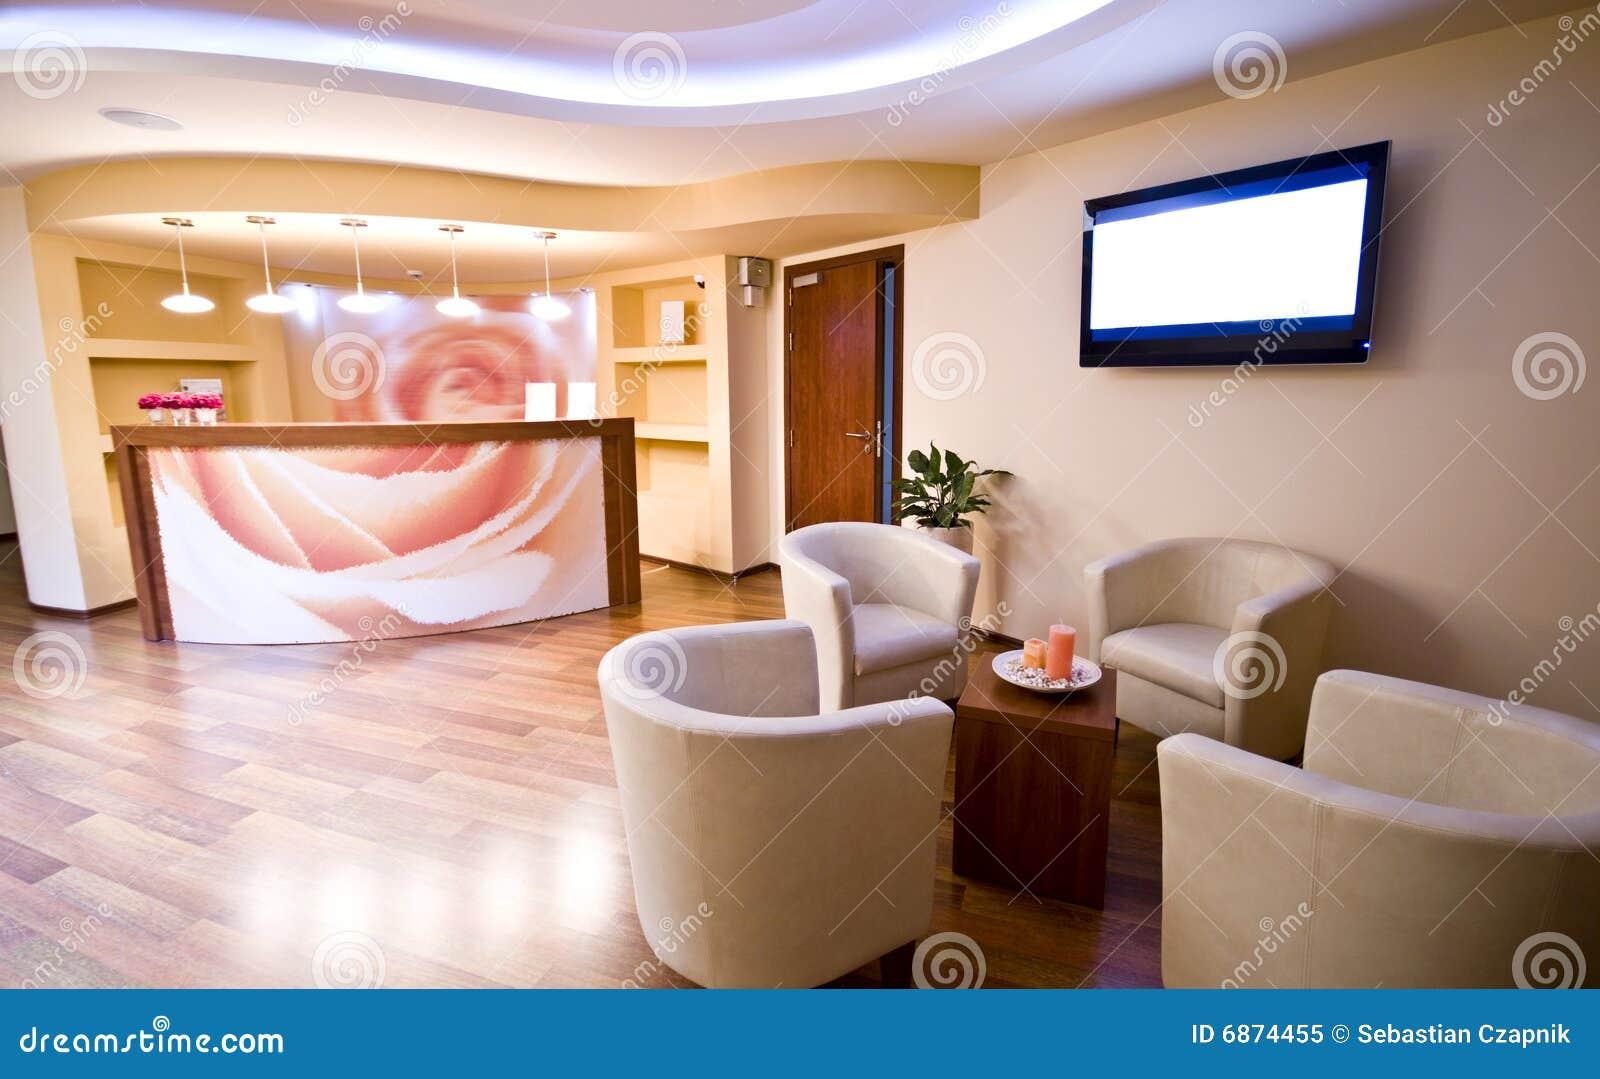 Spa Waiting Room Royalty Free Stock Photo Image 6874455